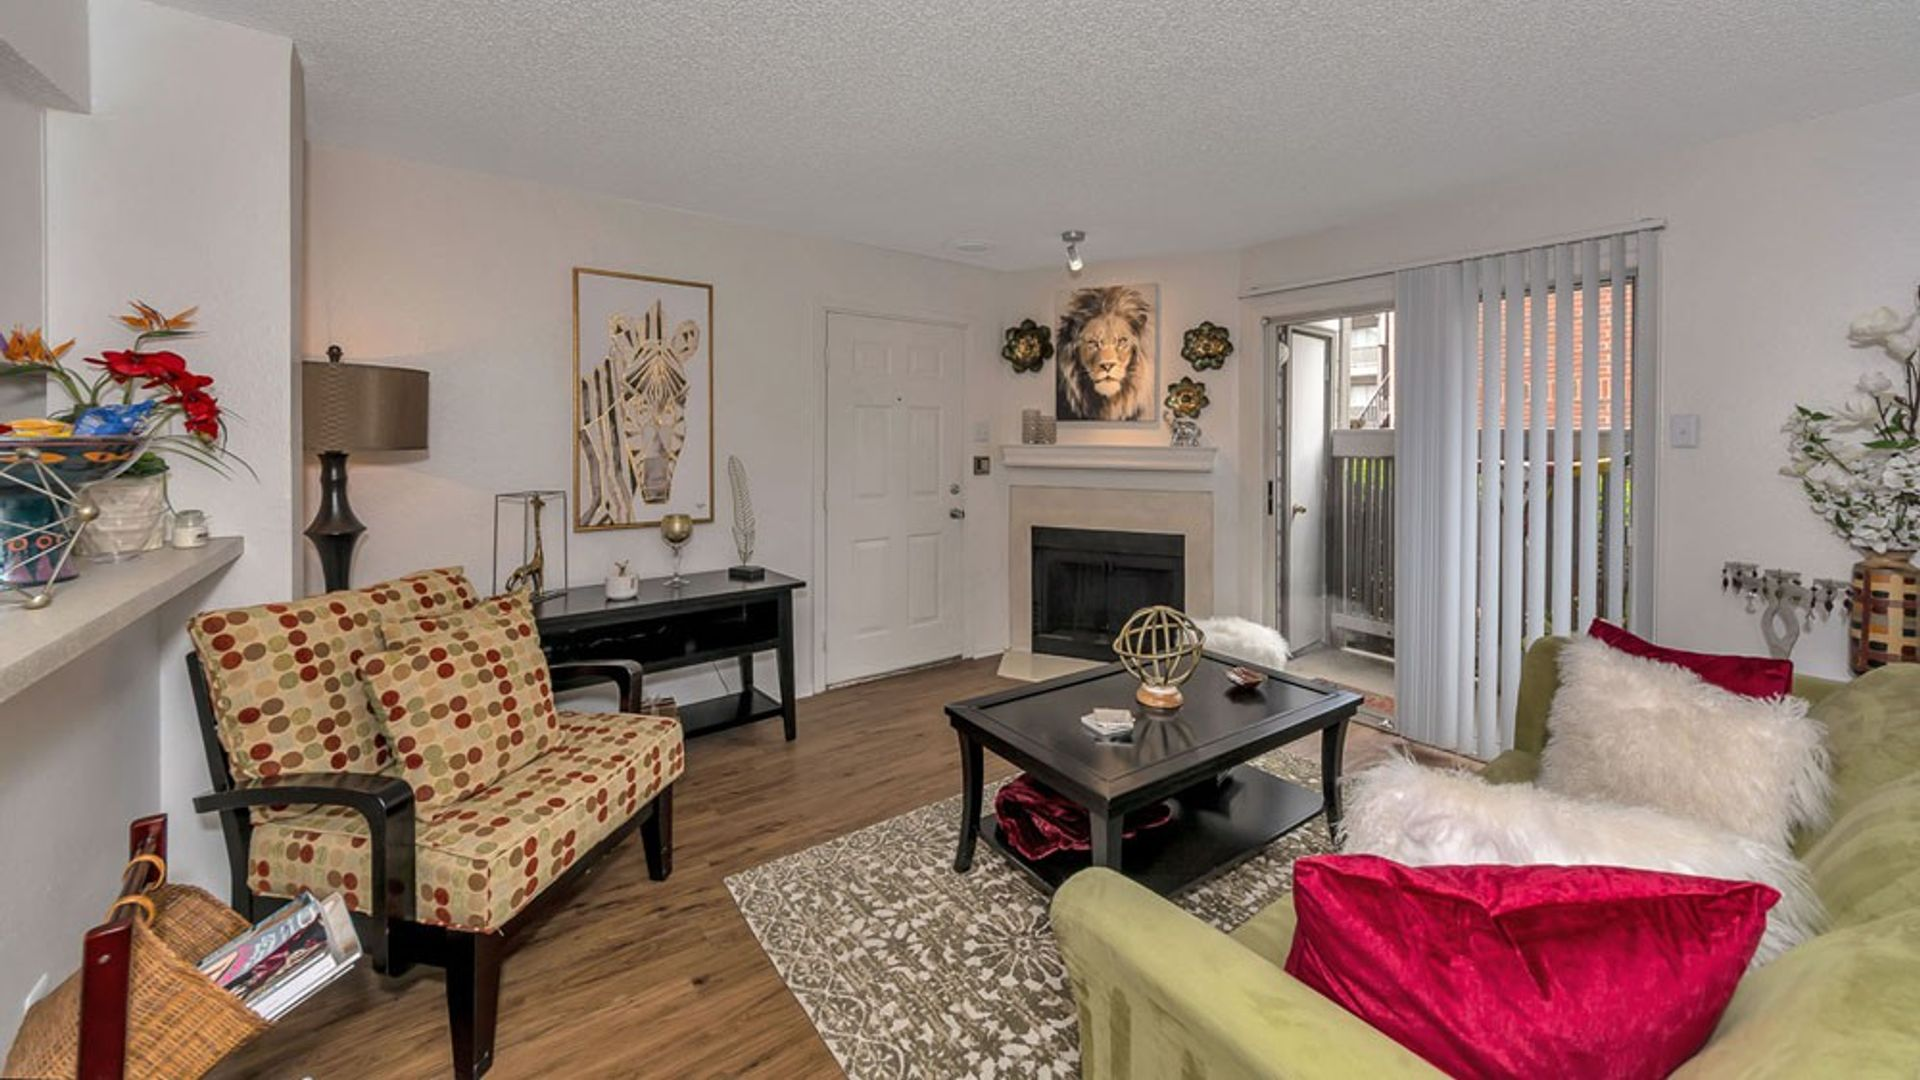 1 bedroom apartment at 4015 joshua lane dallas tx 75287